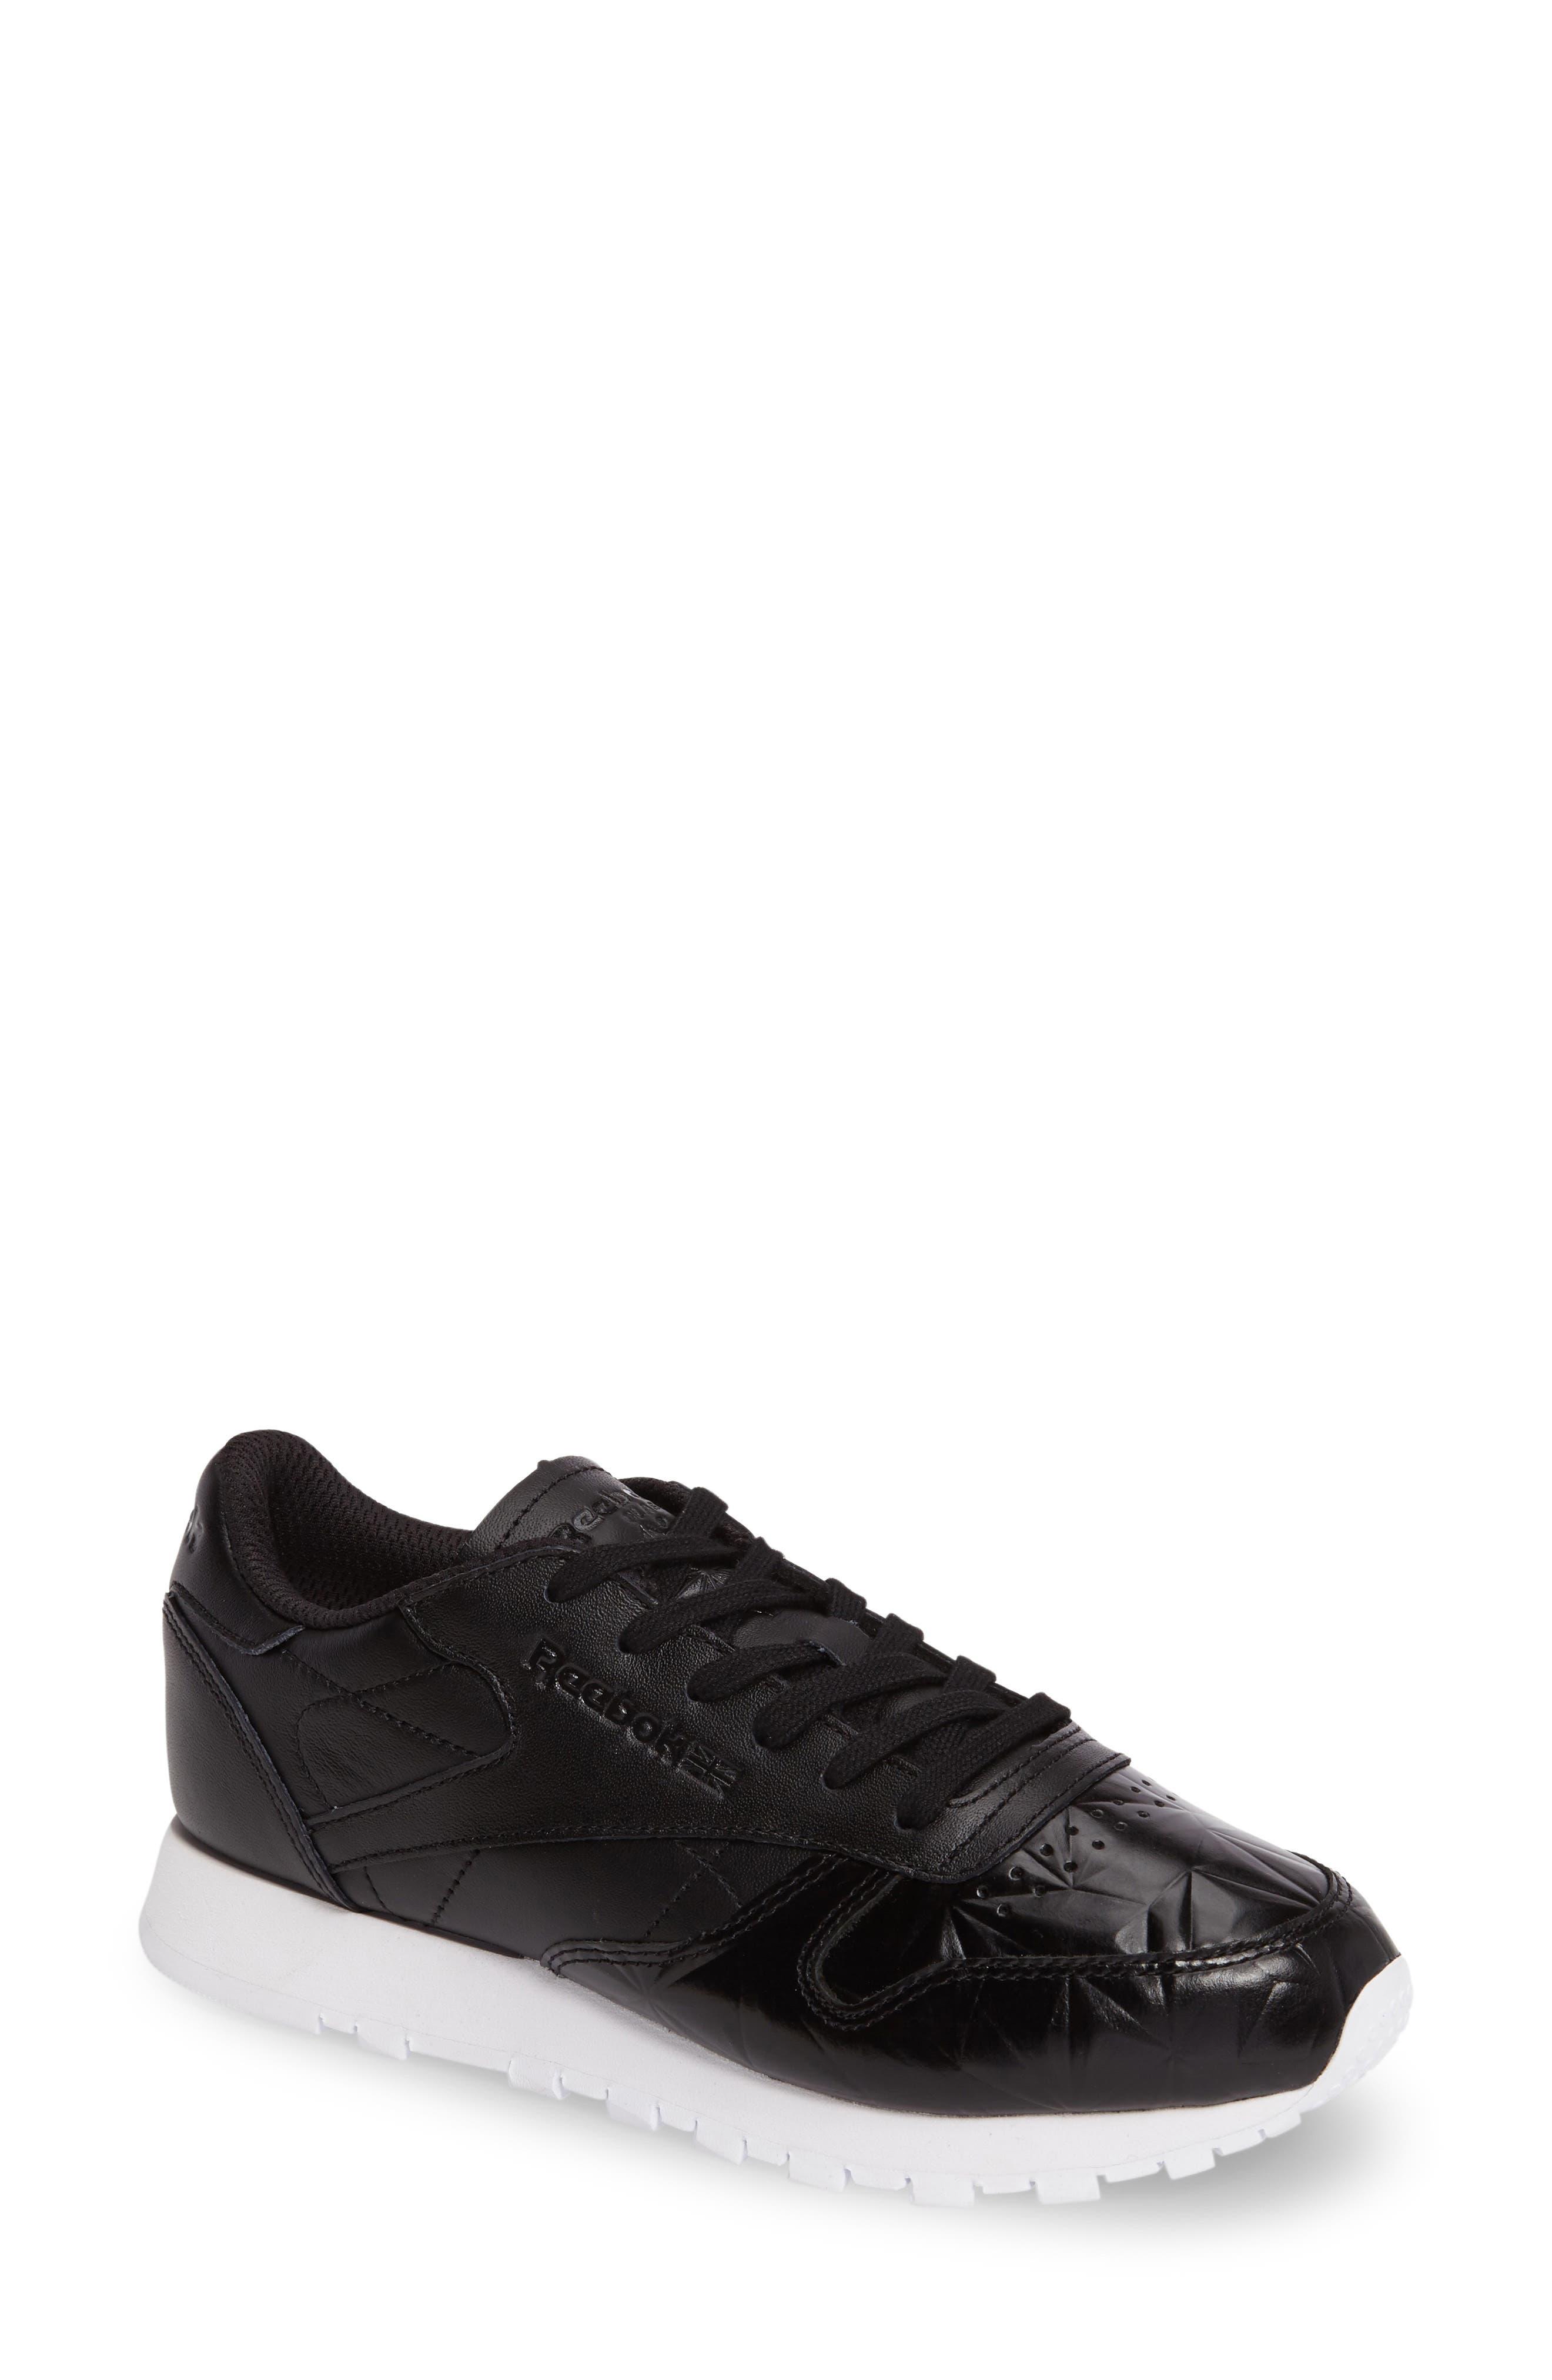 Main Image - Reebok Classic Dynamic Chrome Sneaker (Women)